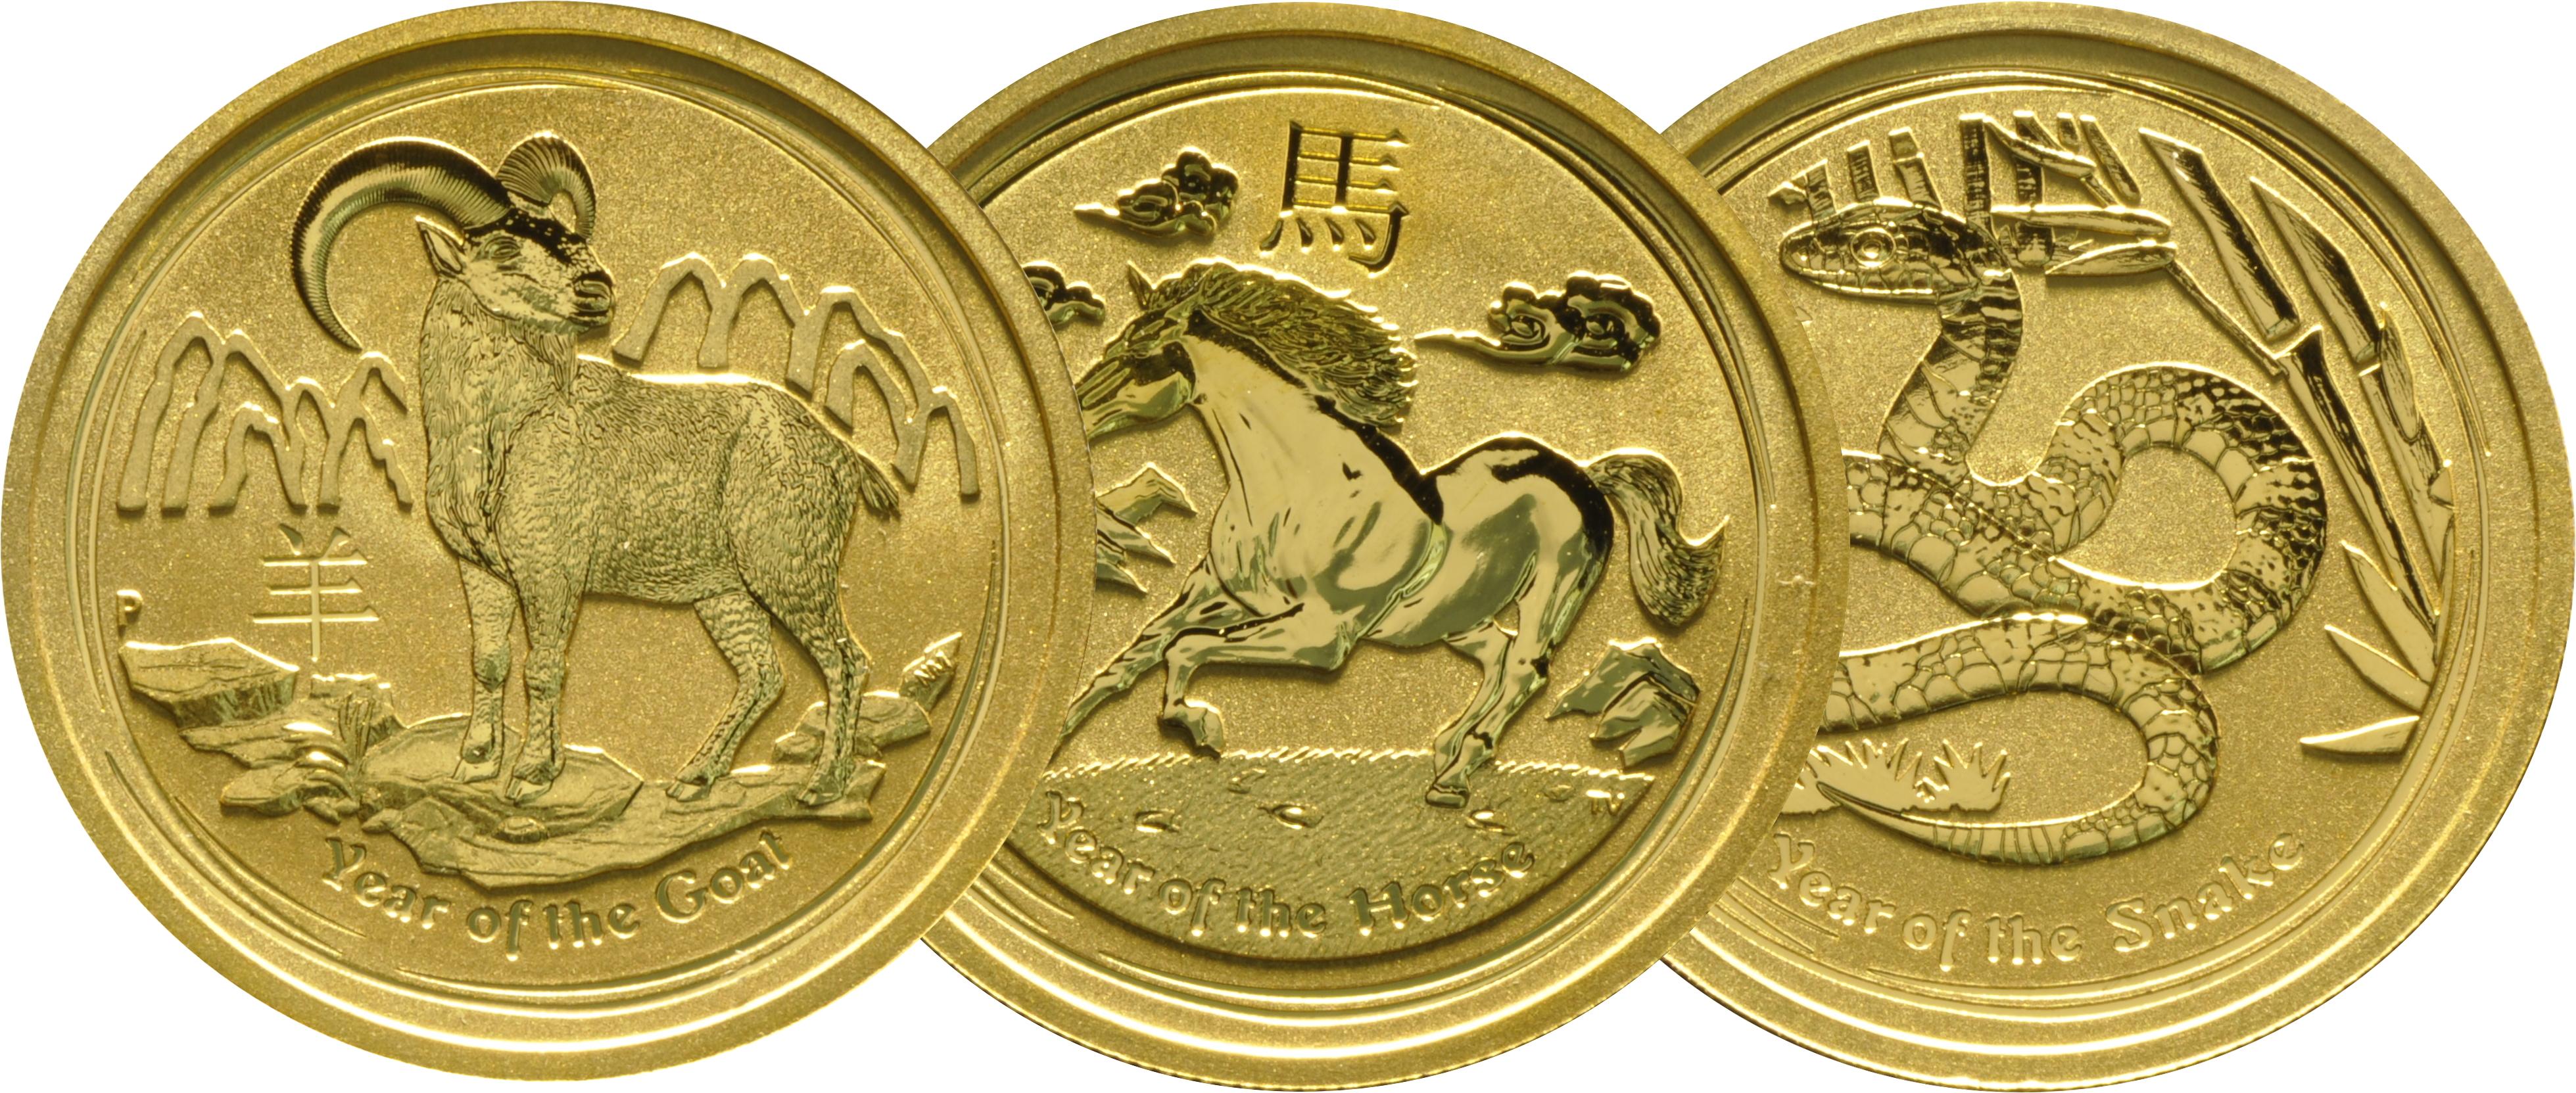 Best Value - Perth Mint Lunar Half Ounce Gold Coin